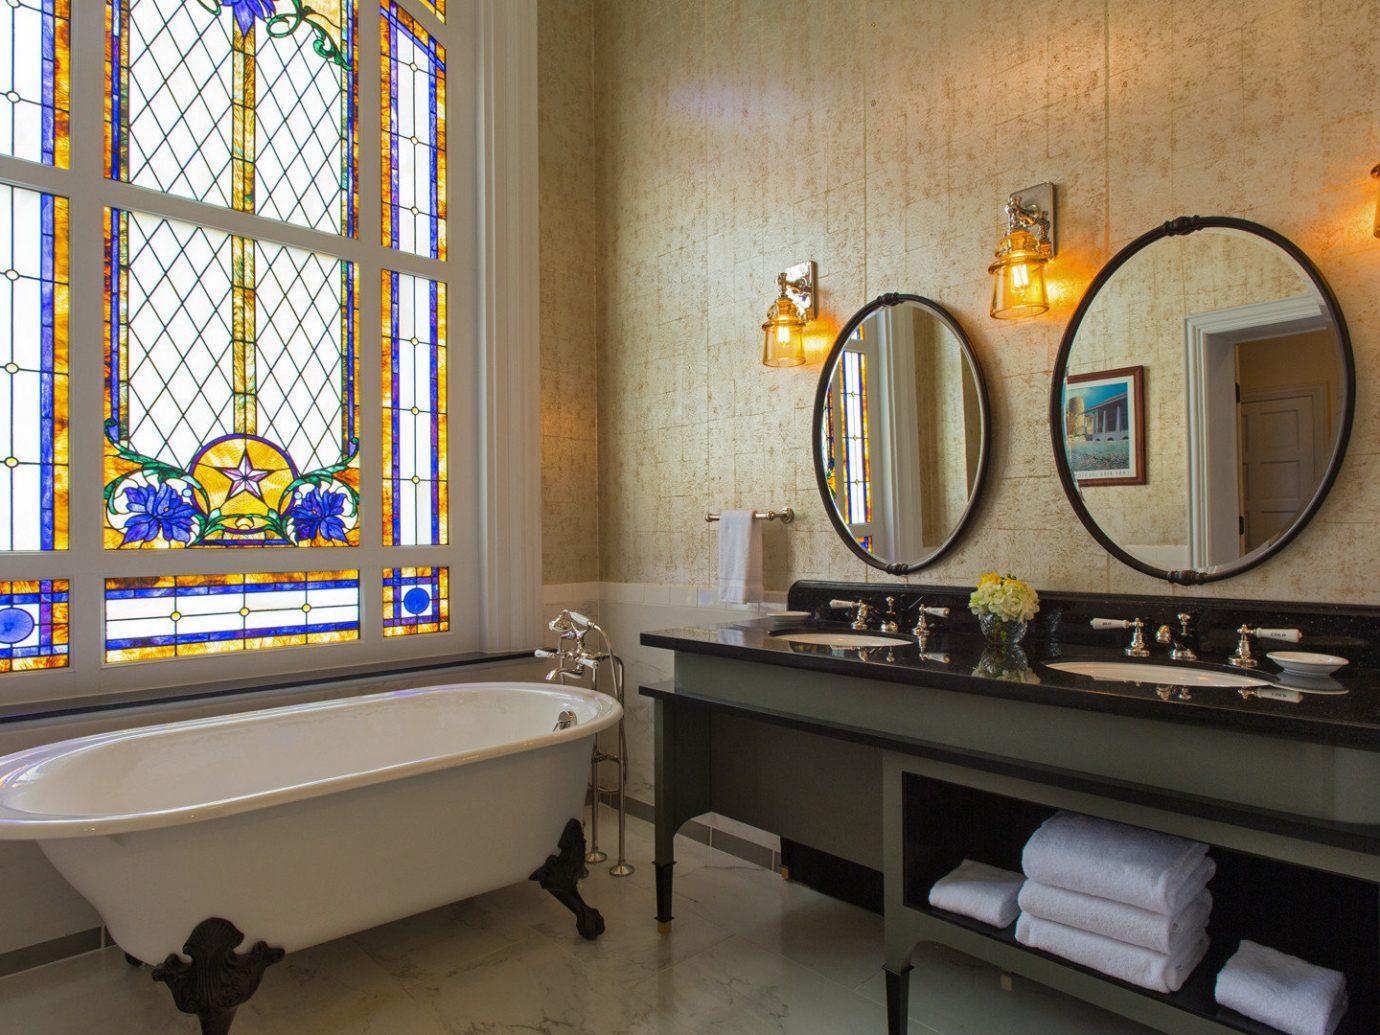 Hotels indoor wall room bathroom interior design window home glass